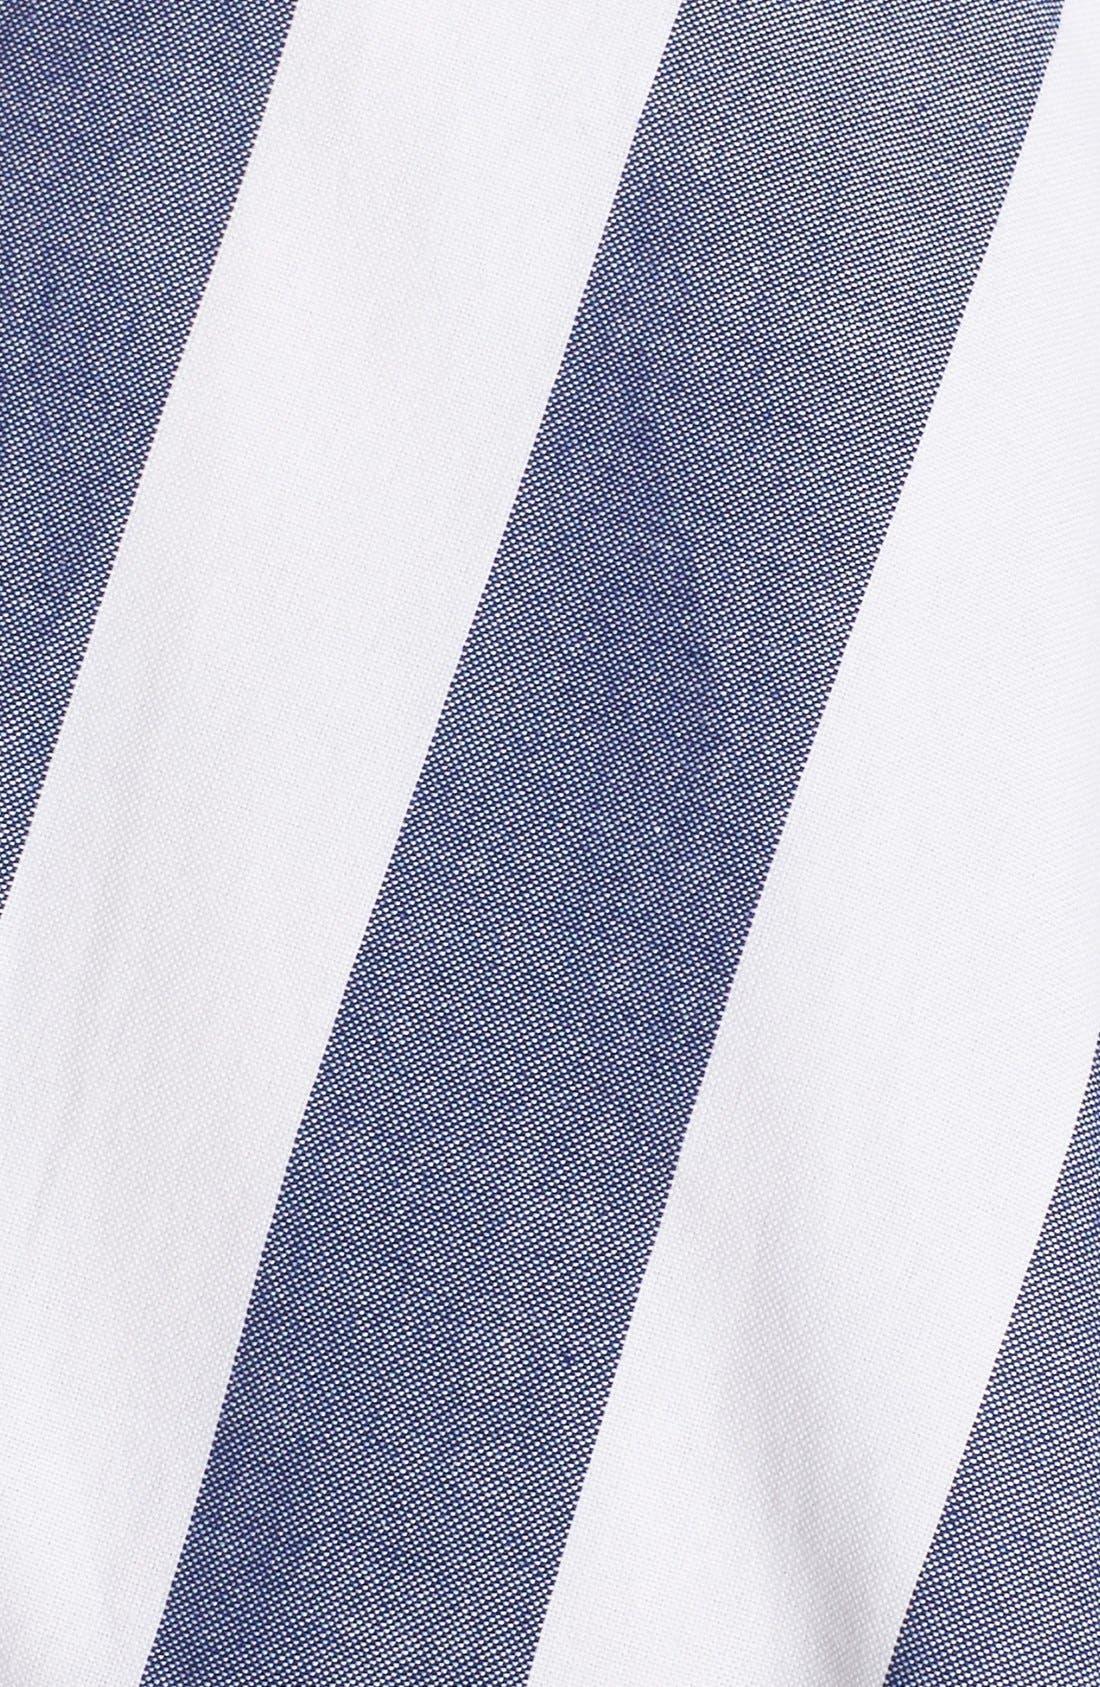 Cotton Fit & Flare Dress,                             Alternate thumbnail 3, color,                             BLUE/ IVORY